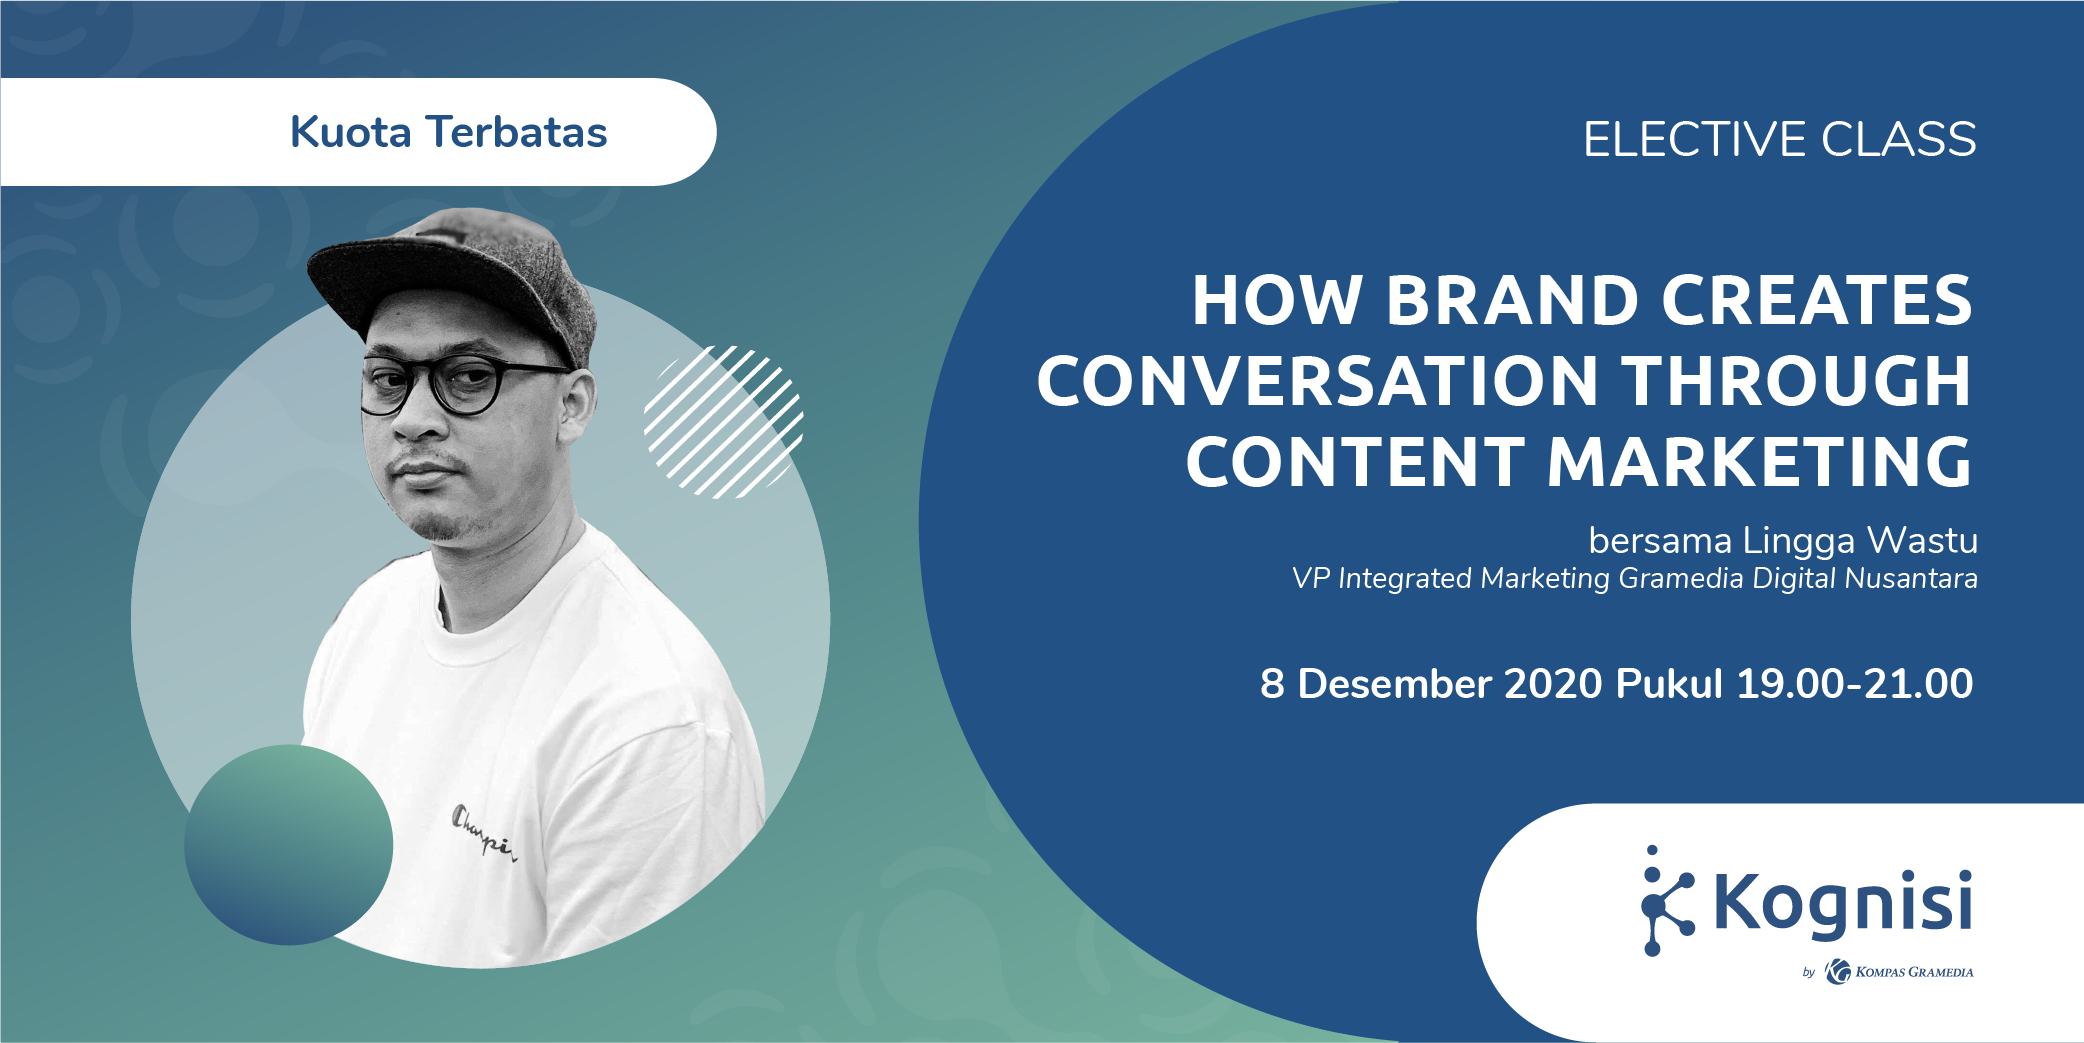 Gambar event How Brand Creates Conversation through Content Marketing dari Kognisi Kompas Gramedia